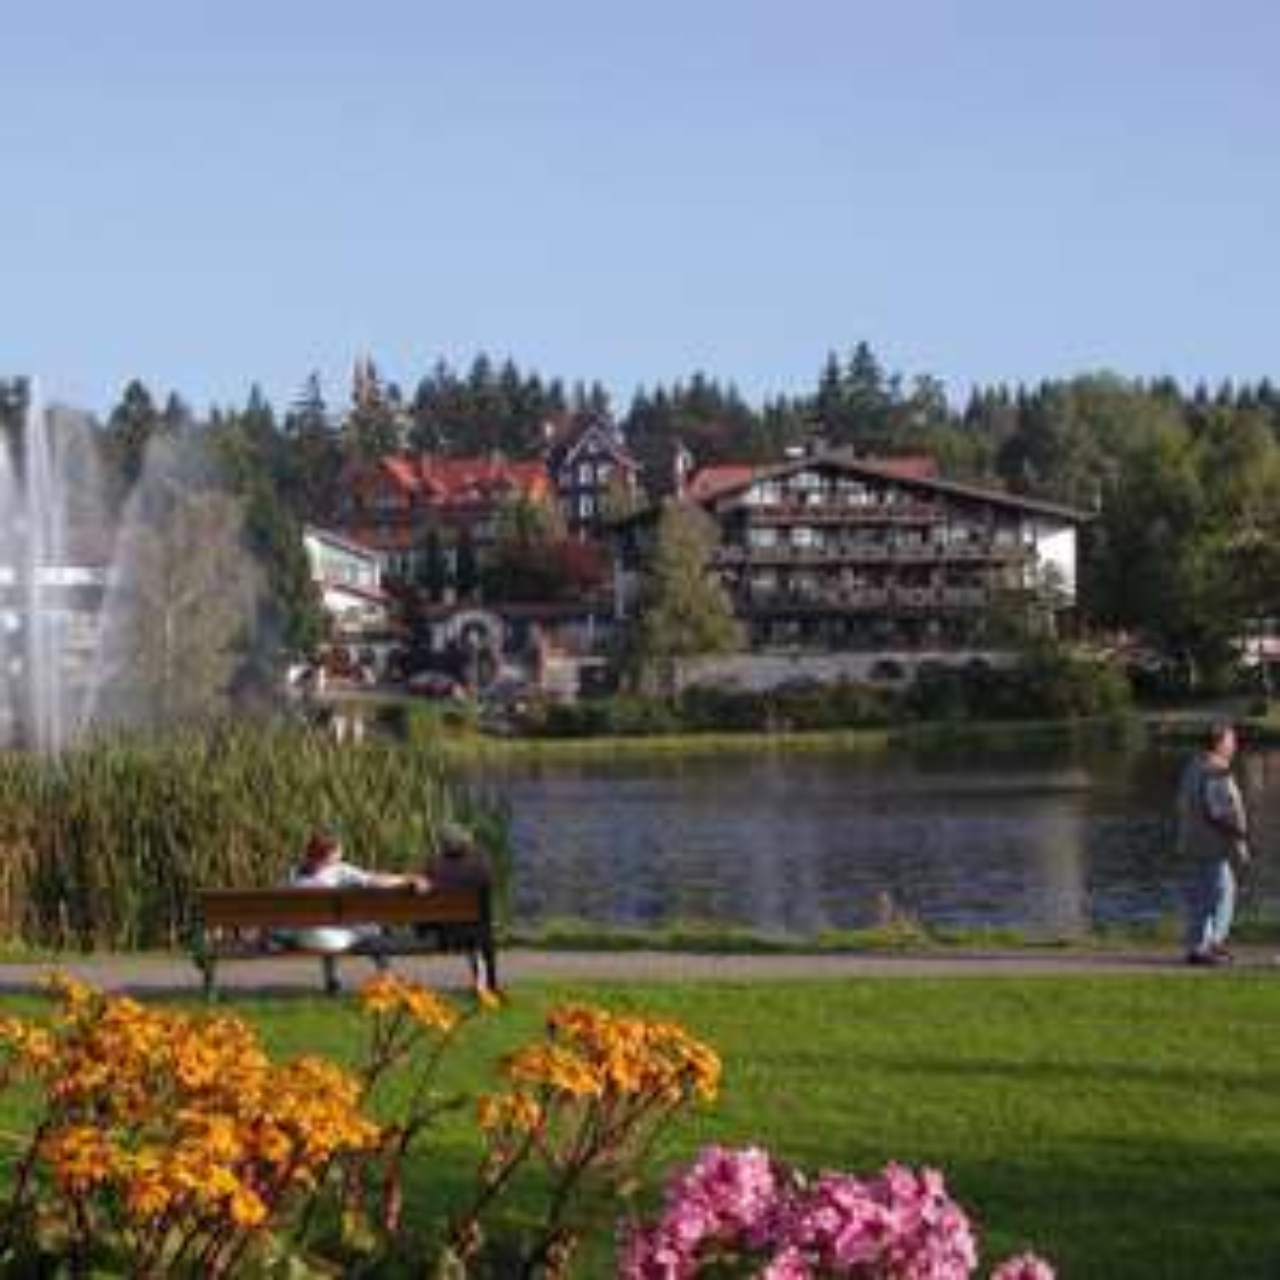 Harz: 3 Nächte inkl. Halbpension - 2 Personen - 4* Hotels am Kranichsee im Oberharz